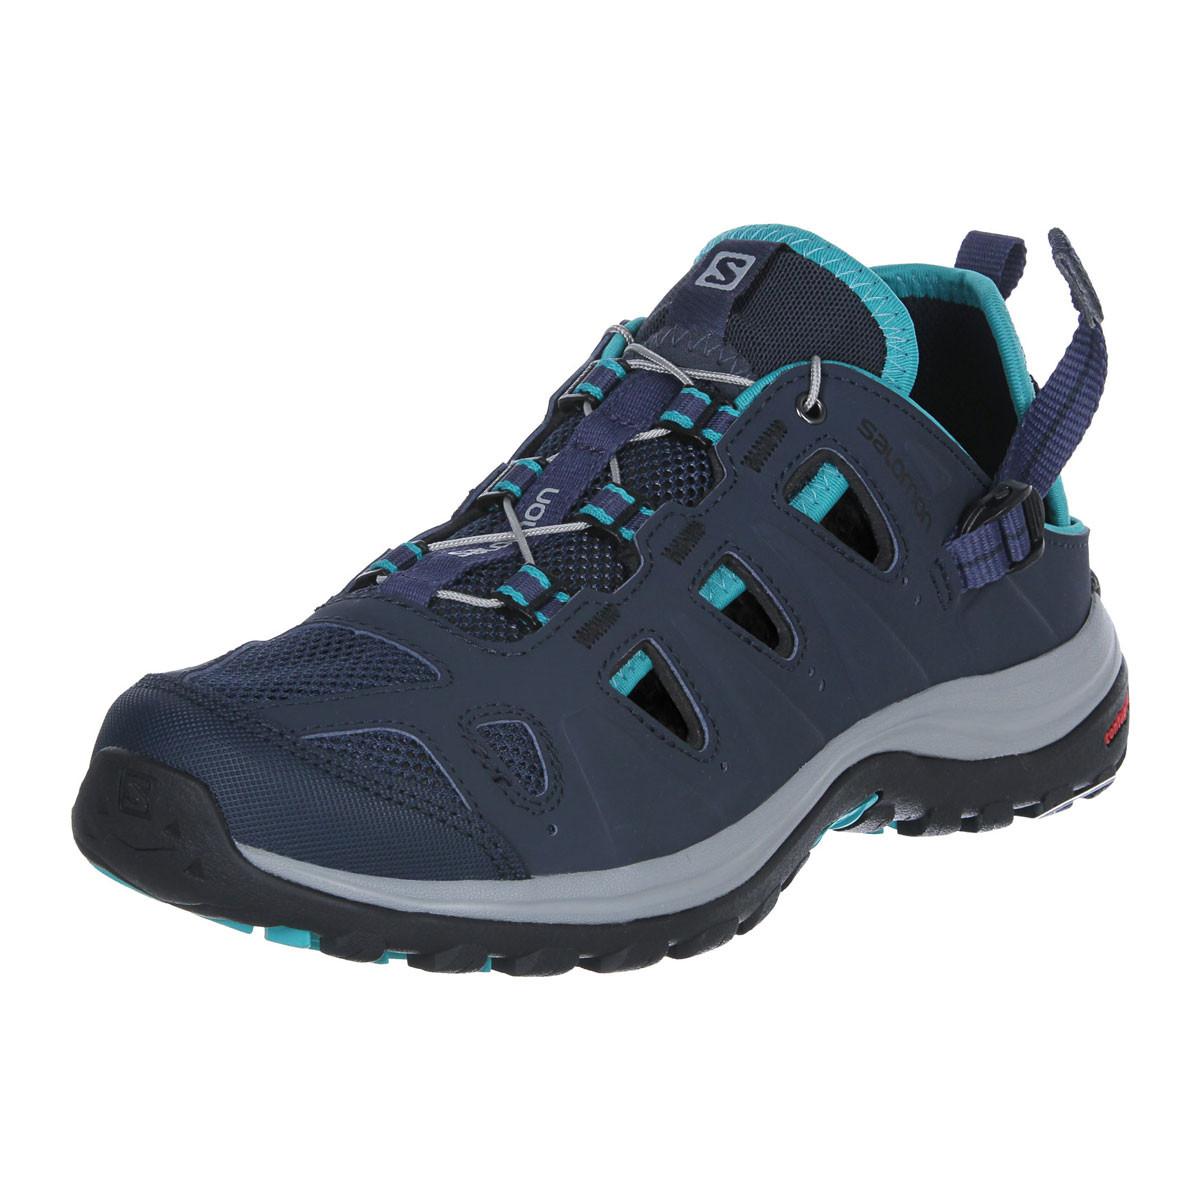 Salomon Ellipse Cabrio women's walking sandals at Activ Instinct for £34